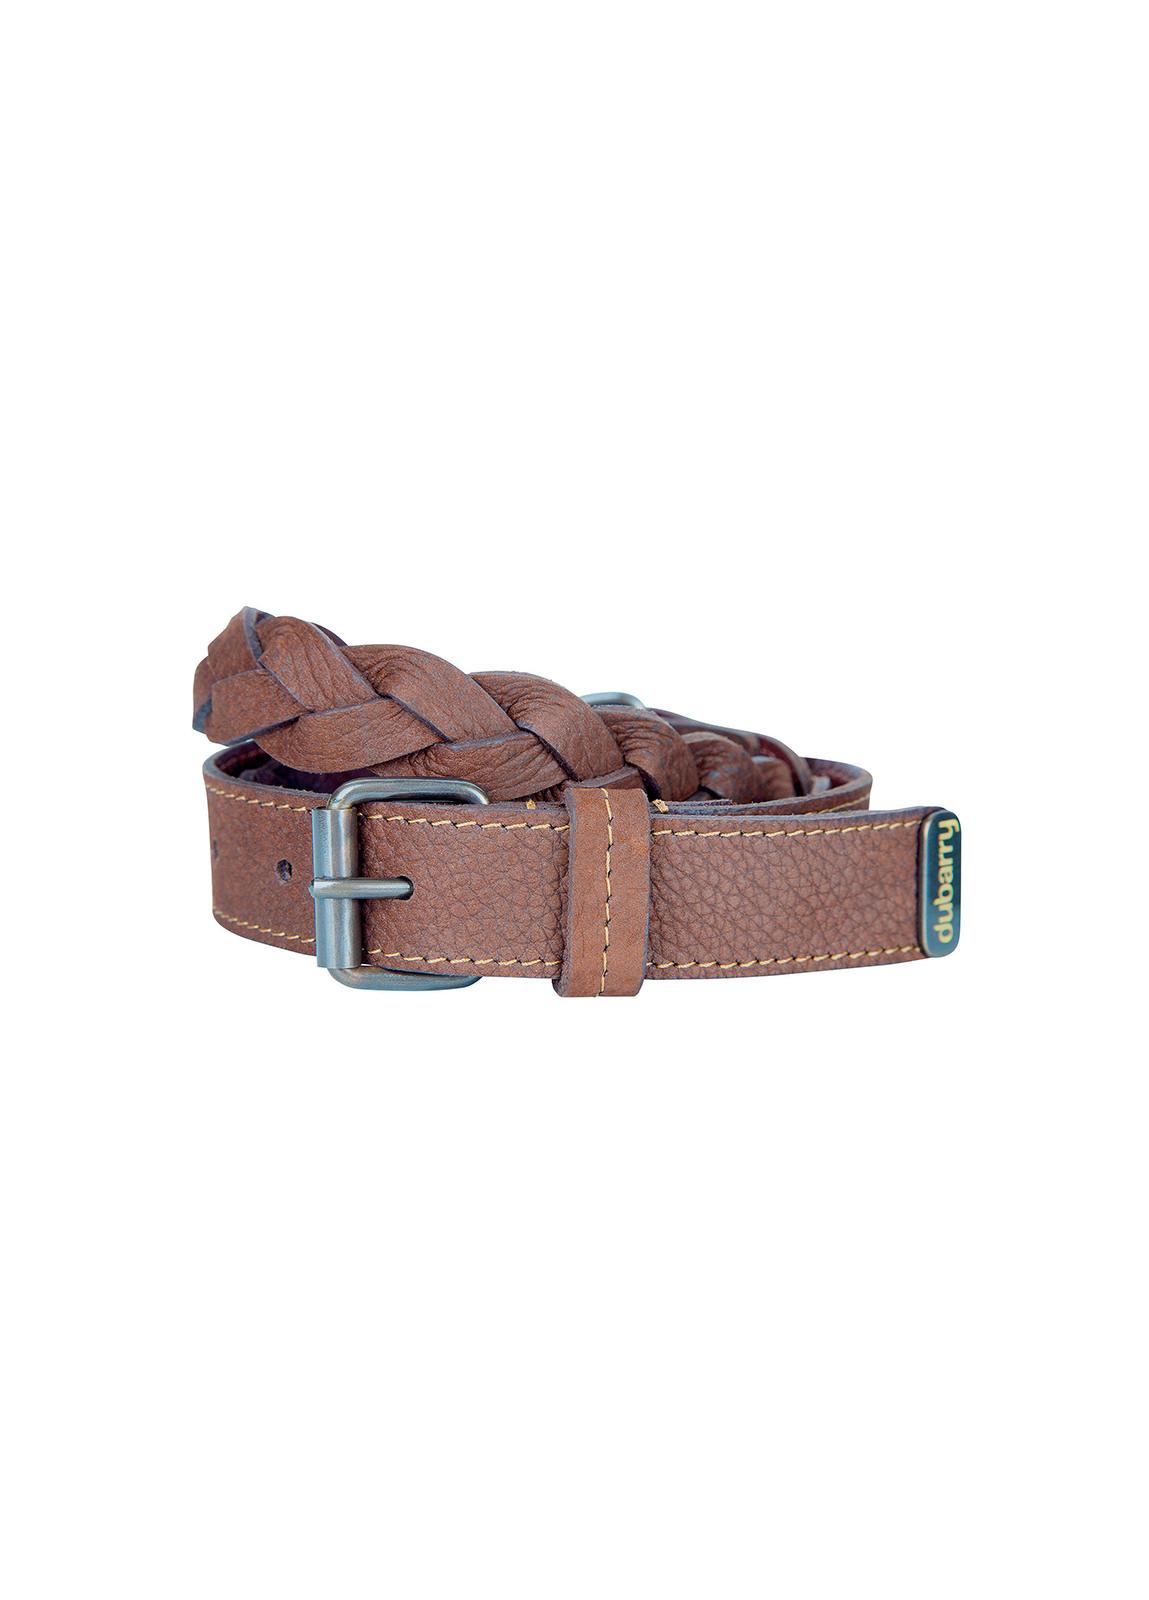 Dubarry_ Donmore Women?s Leather Belt - Walnut_Image_1